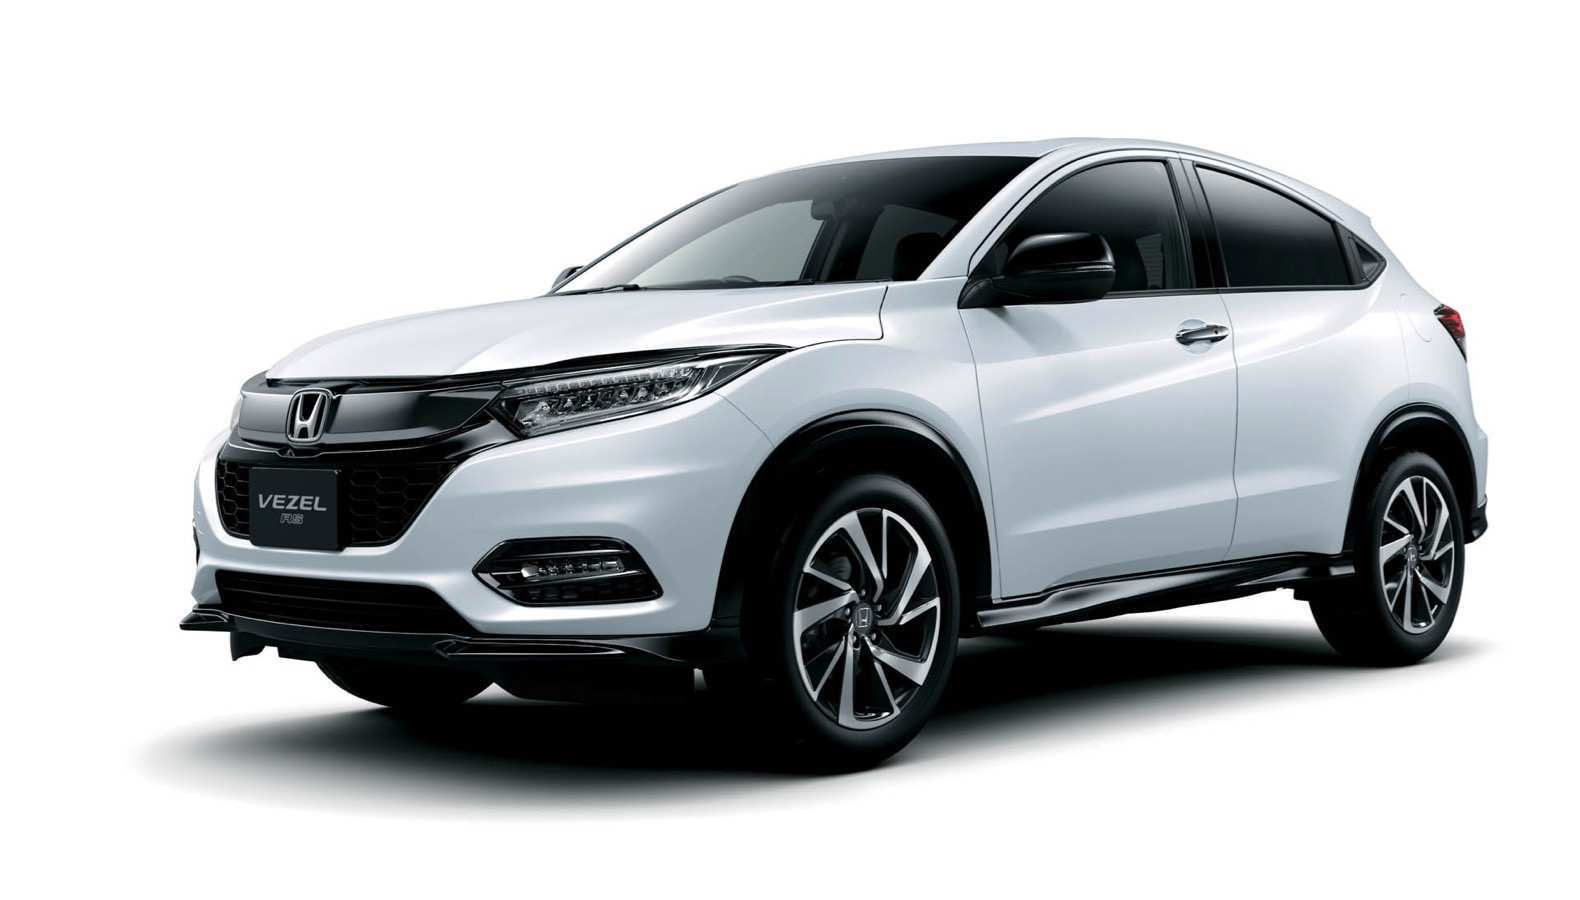 92 Concept of 2019 Honda Vezel Performance with 2019 Honda Vezel